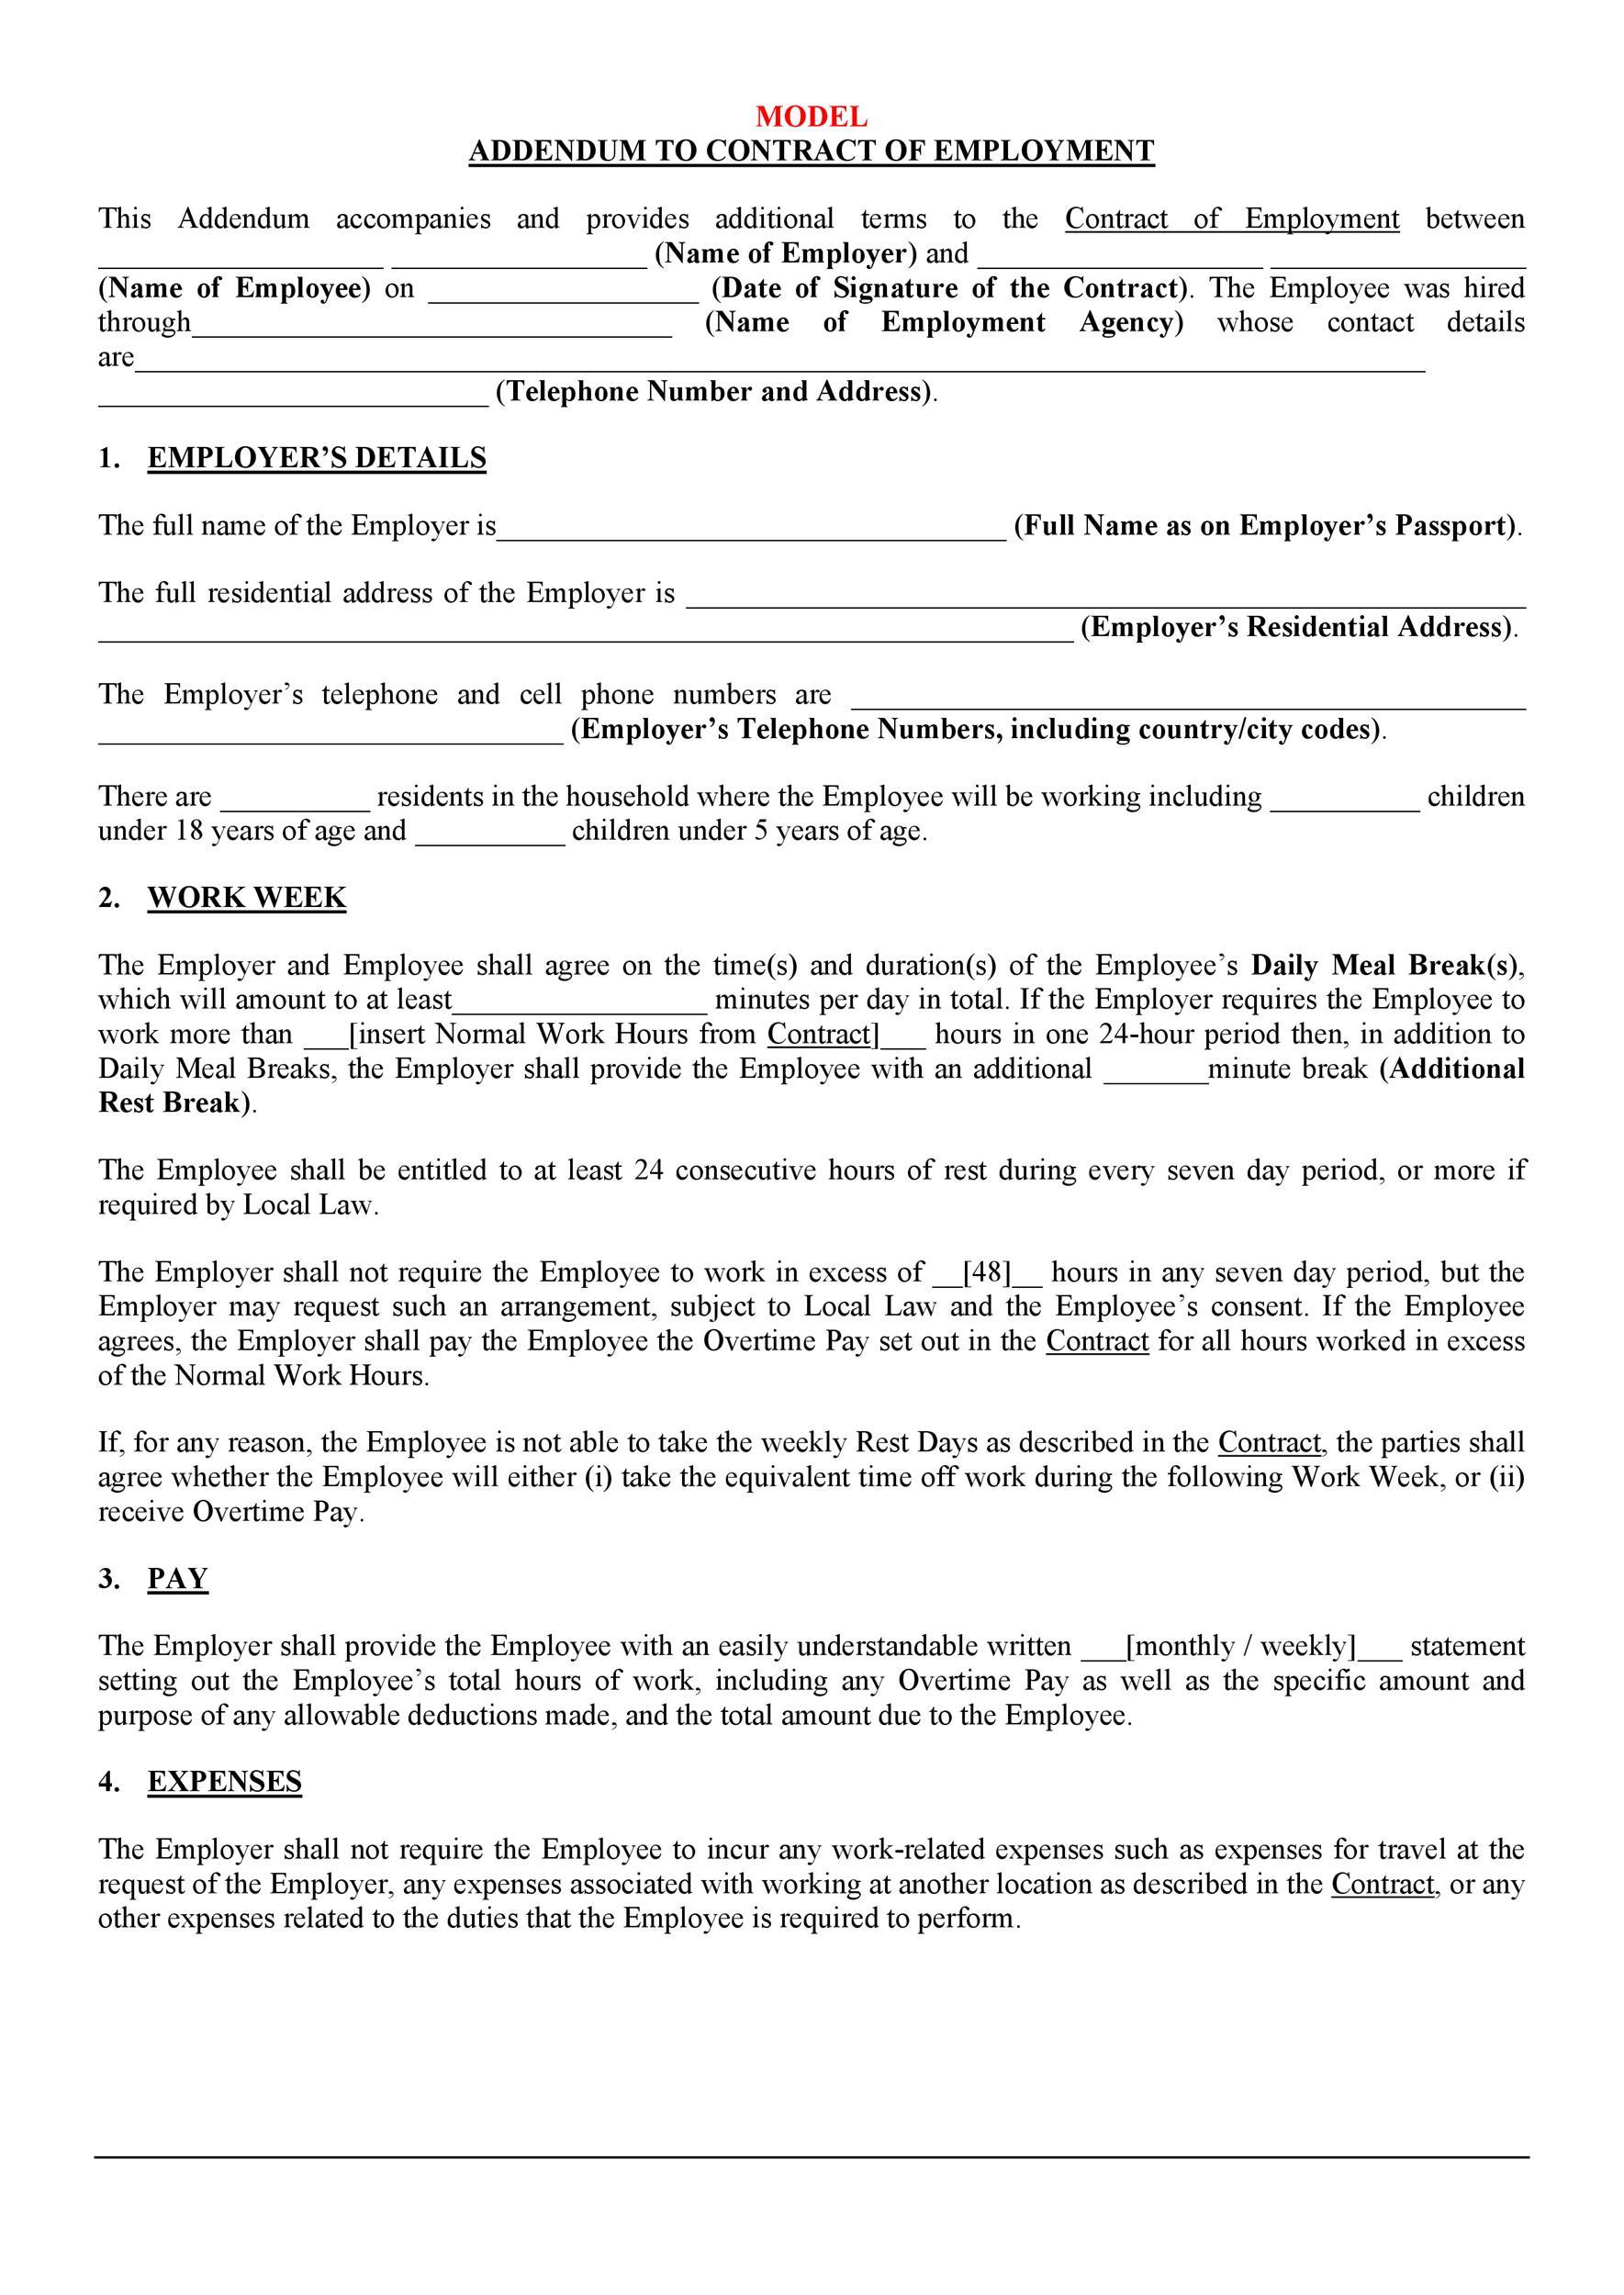 Addendum Sample Letter Agreement.44 Professional Contract Amendment Templates Samples ᐅ